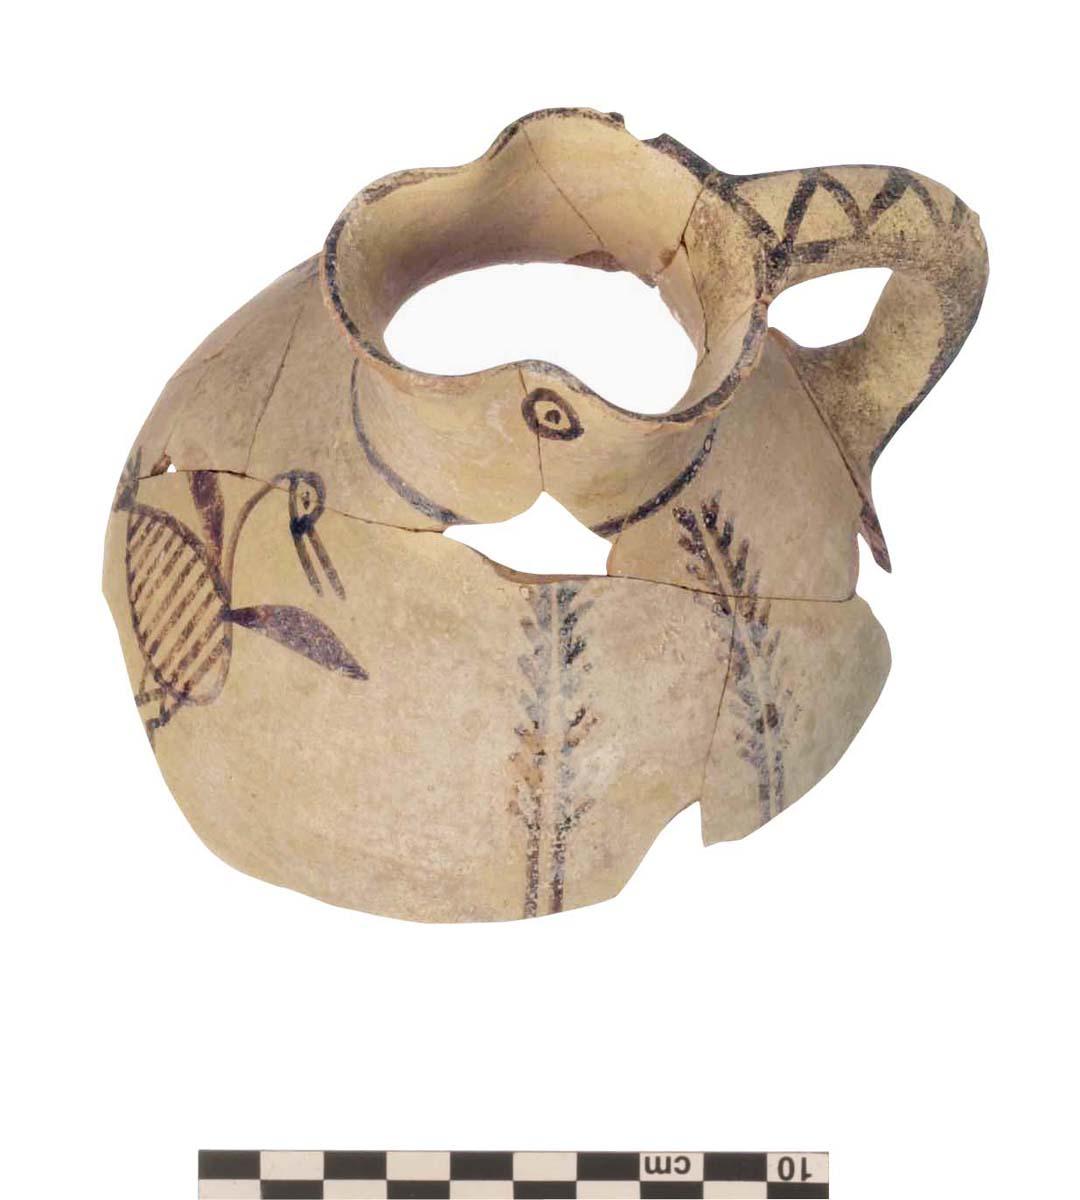 Bothros, cruche à oiseau Bichrome (Ph. Collet / Archives EFA, N032-067)